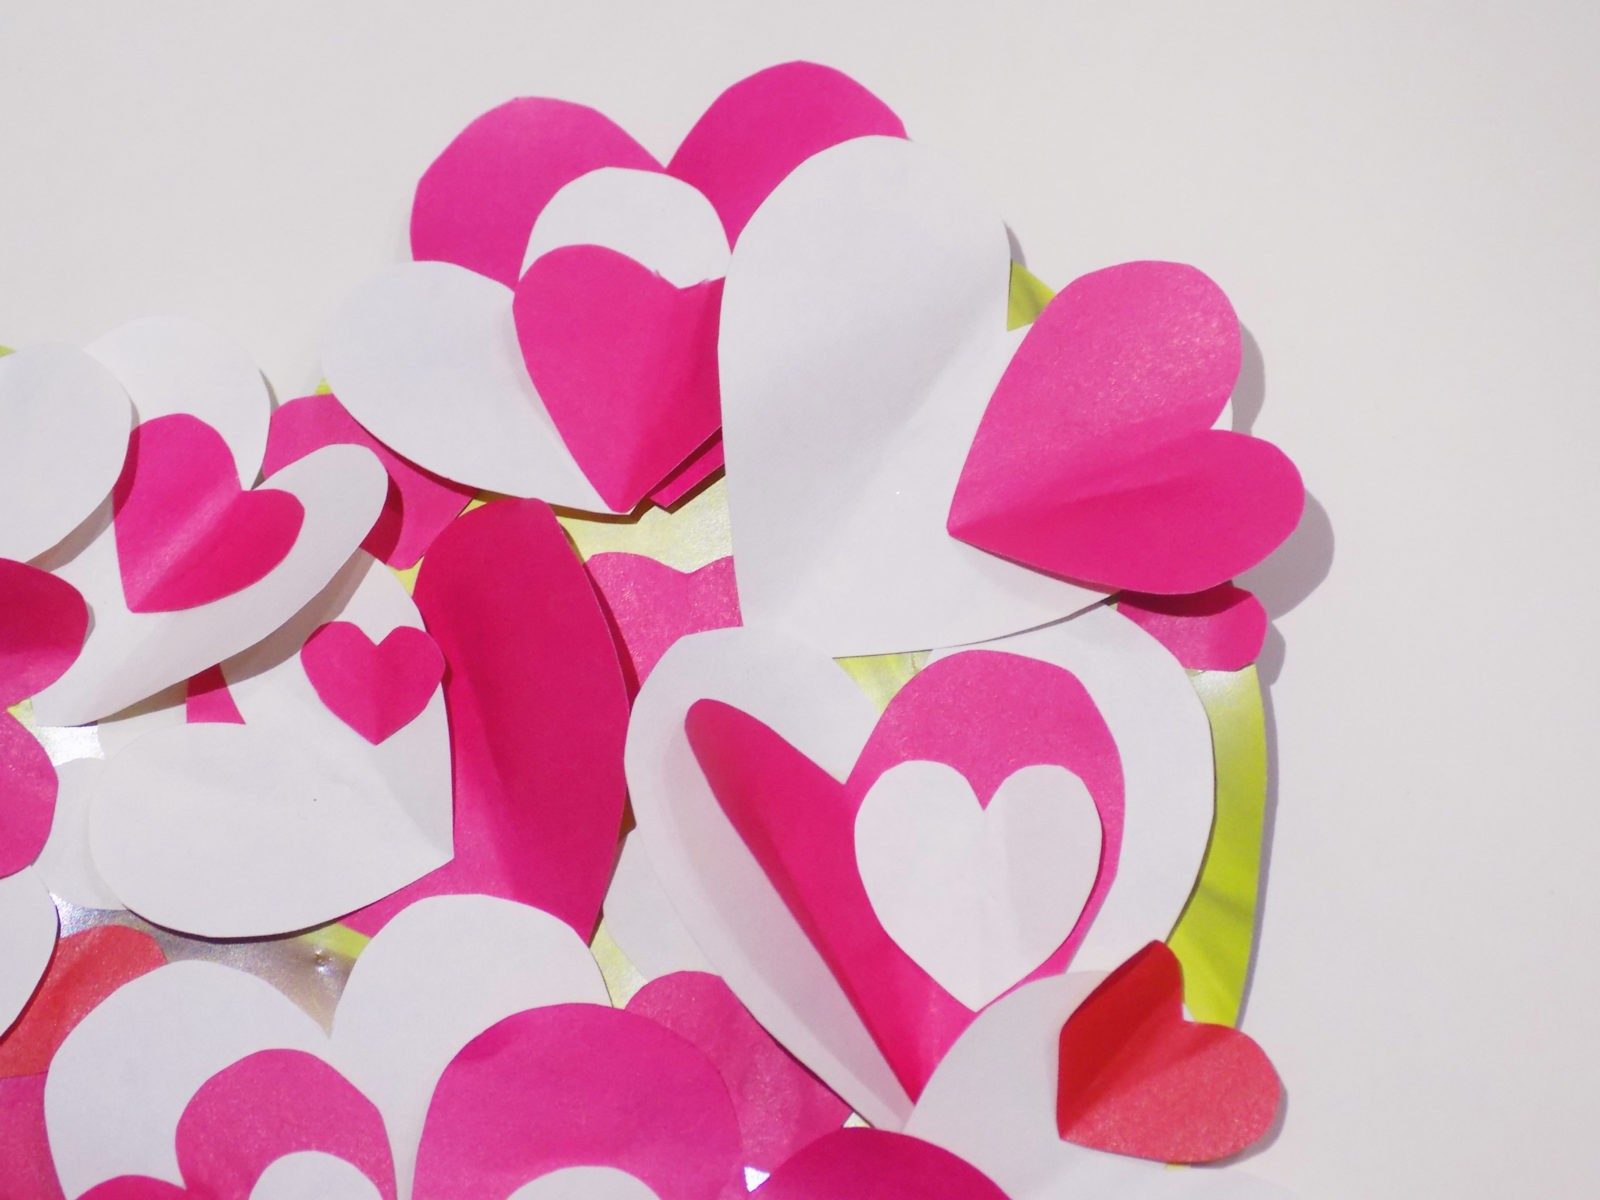 Сердце панно на День святого Валентина -6